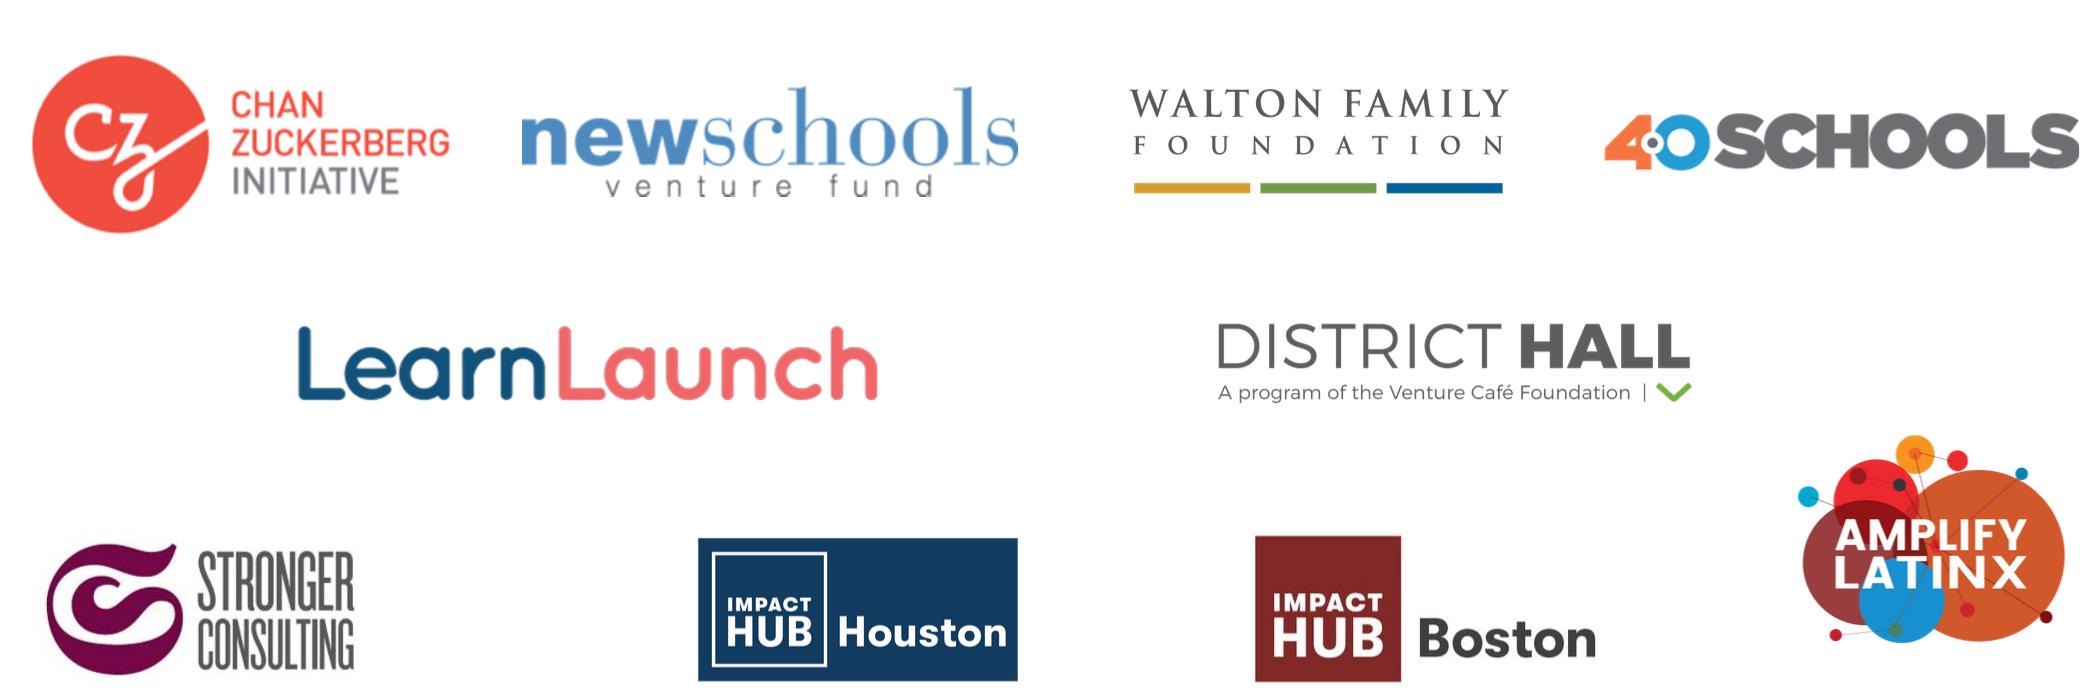 Innovation Sponsors w Walton